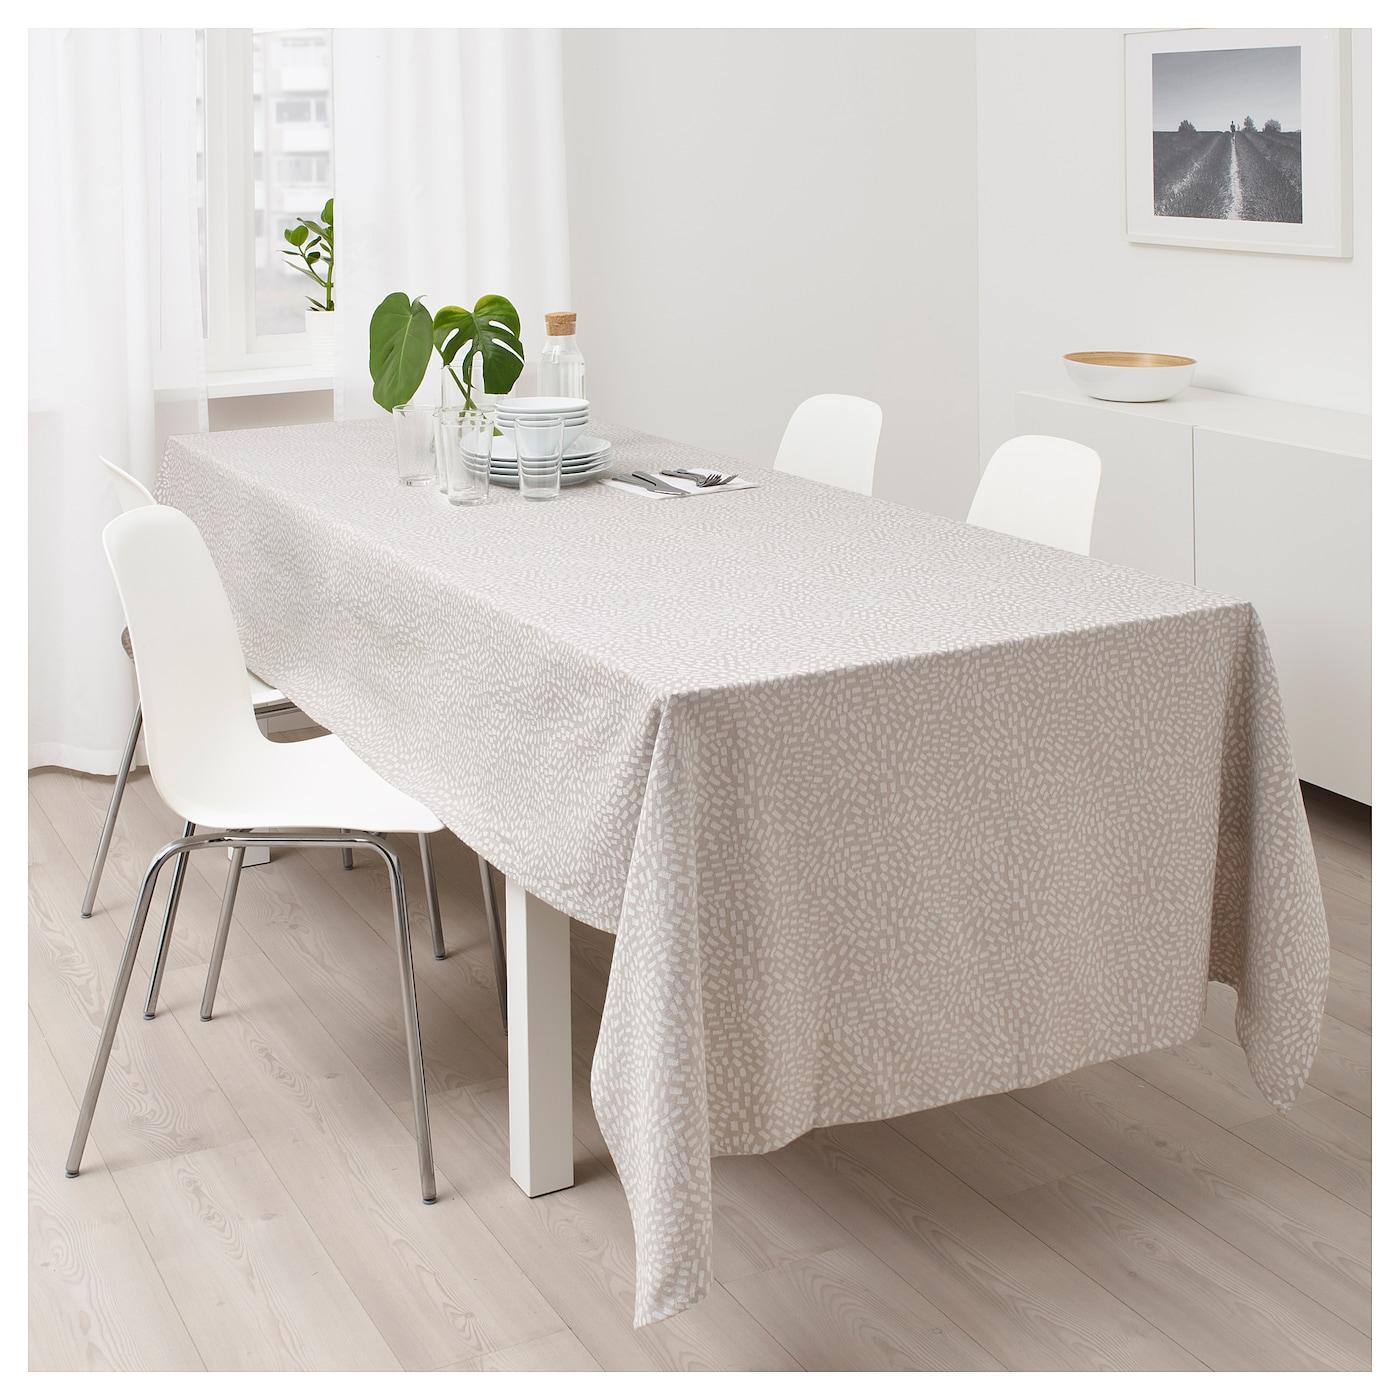 Genial IKEA SOMMAR 2018 Tablecloth